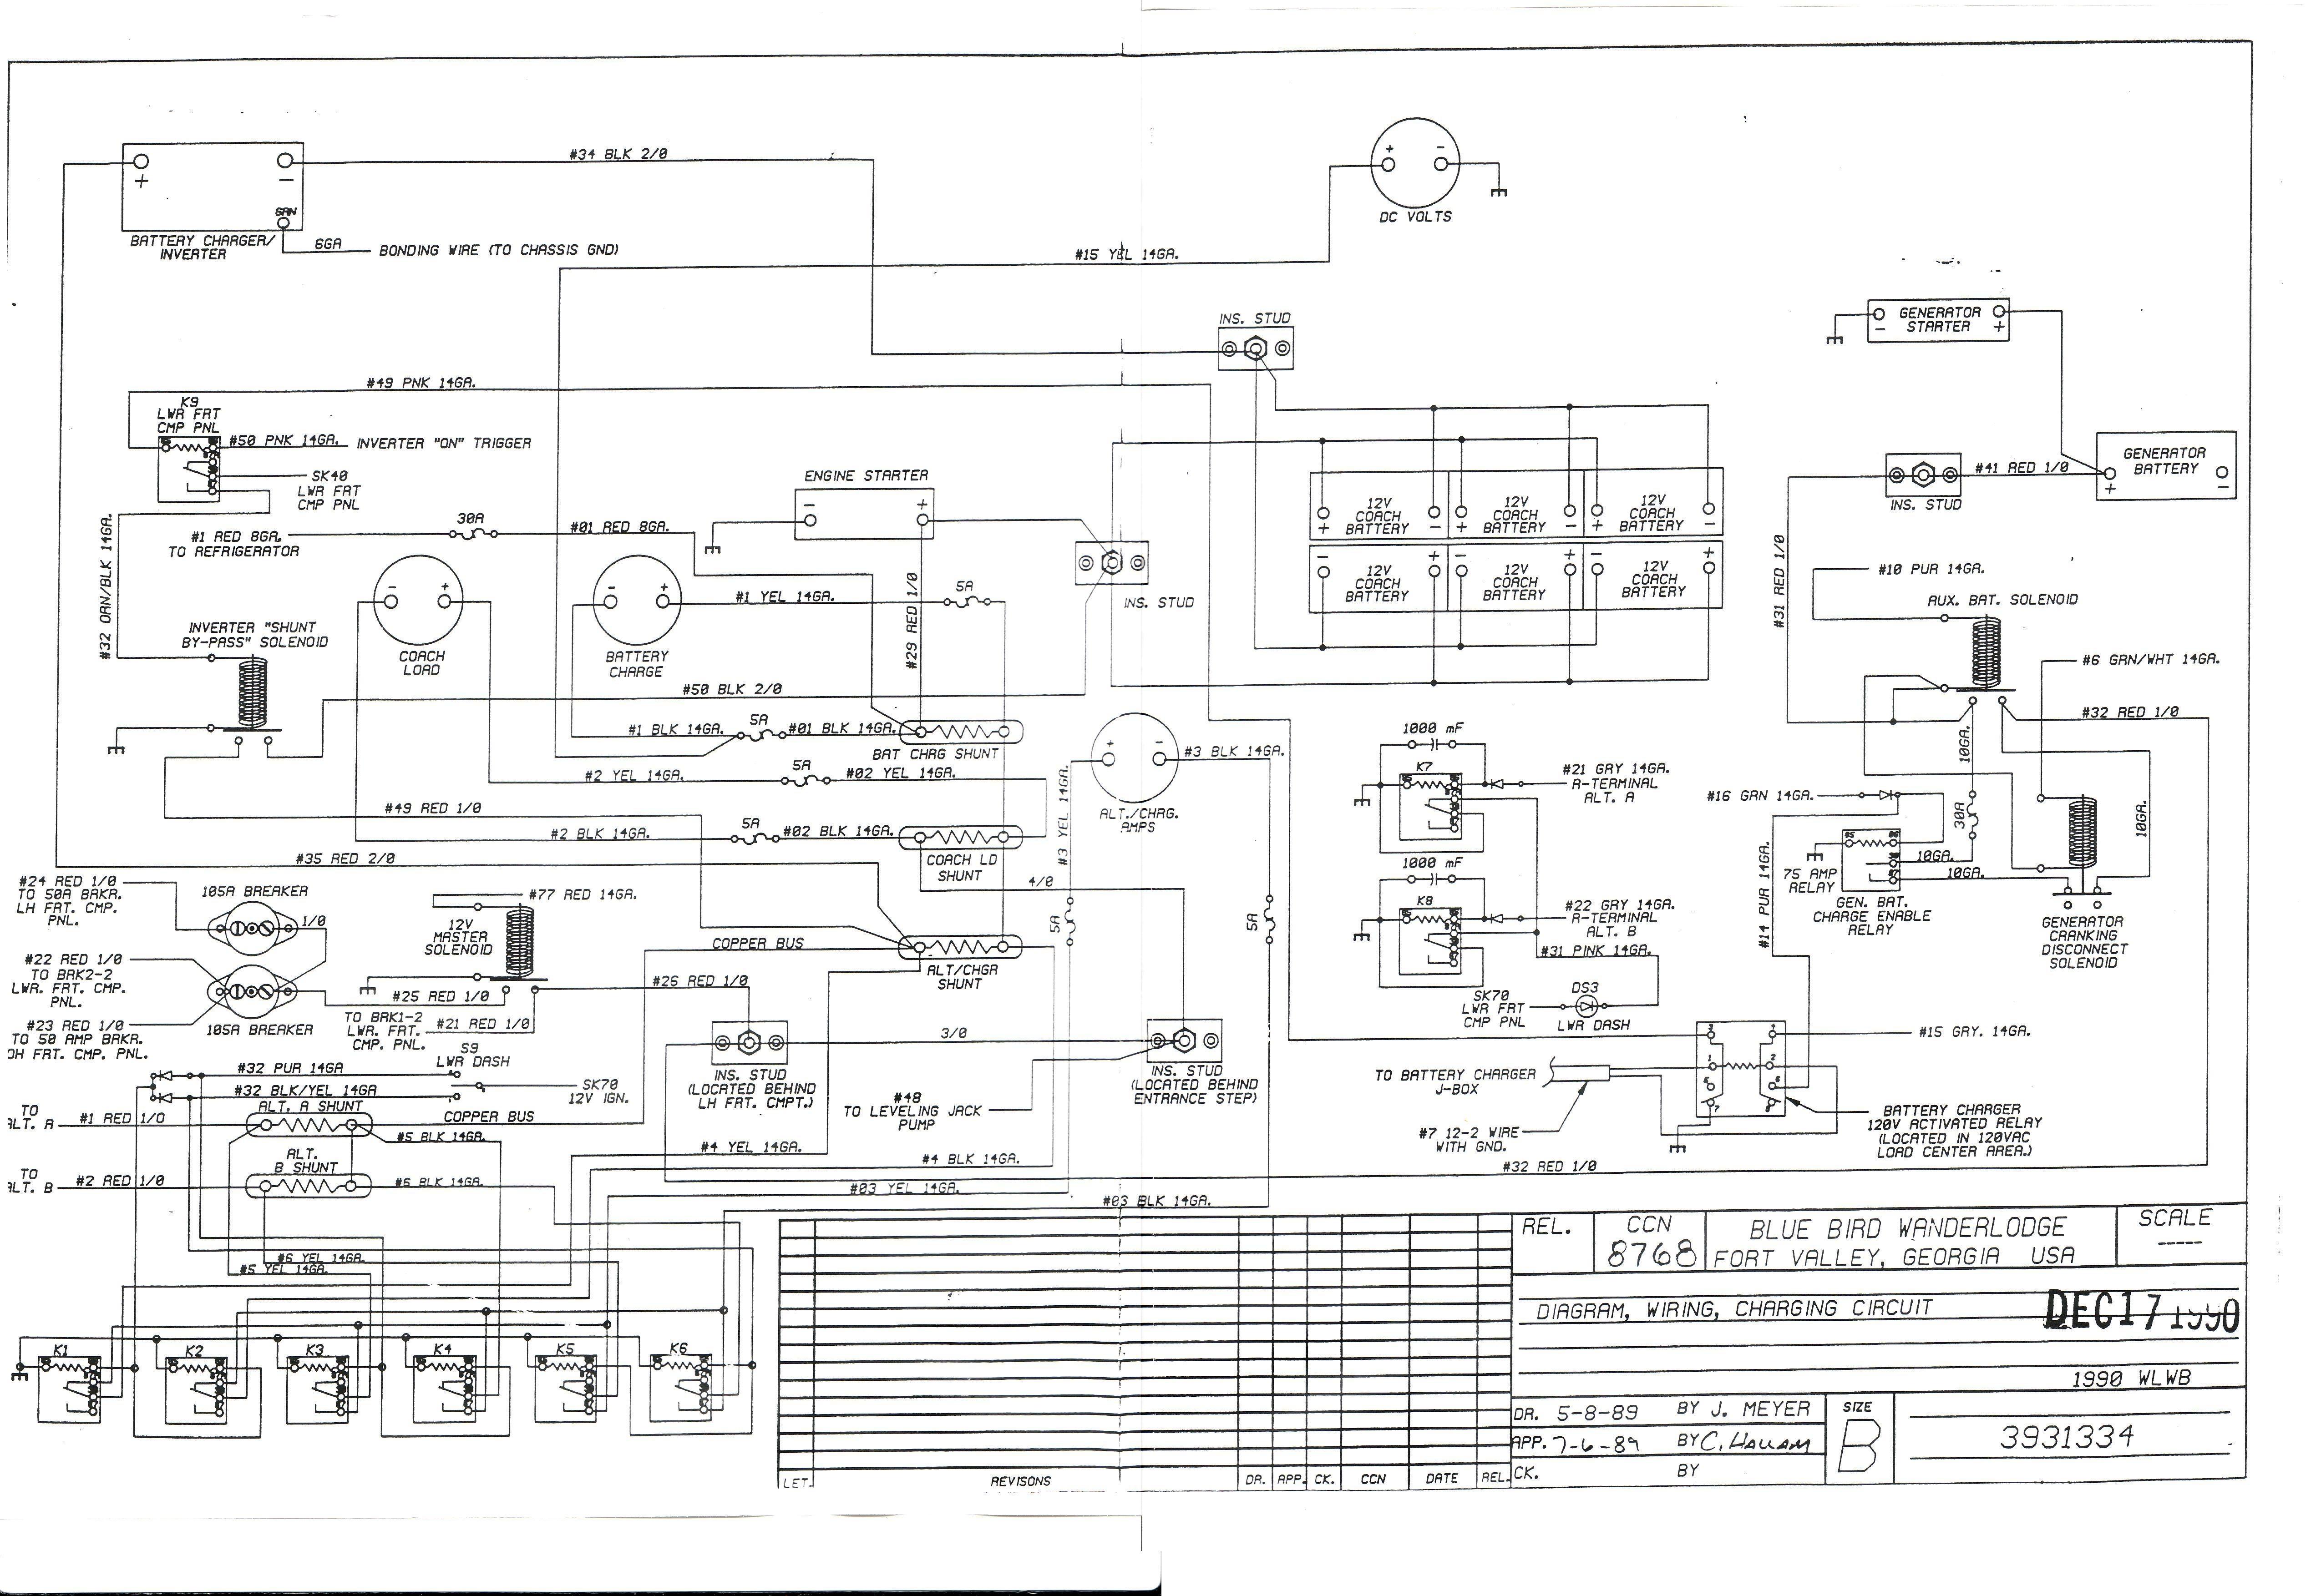 bluebird school bus wiring diagrams schematic diagrambluebird bus wiring schematics wiring data diagram numbers of bus connector diagrams 2002 bluebird bu wiring